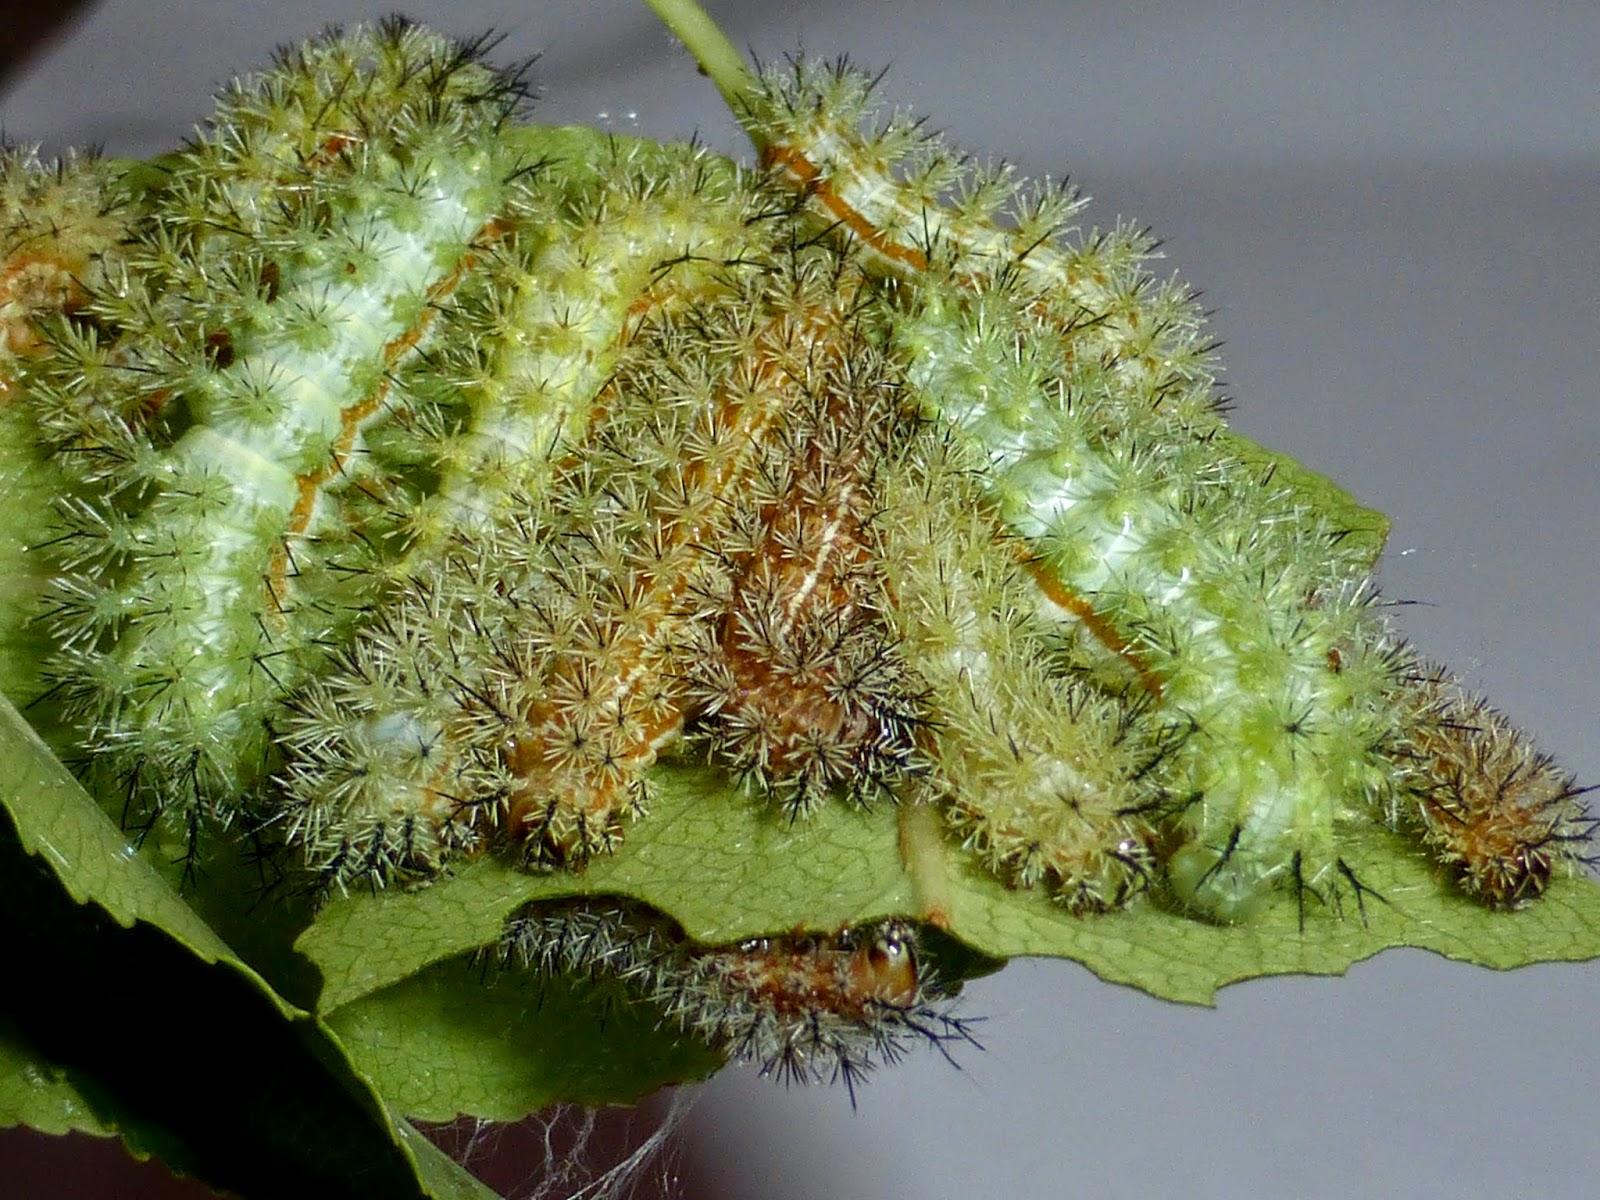 Automeris io caterpillar